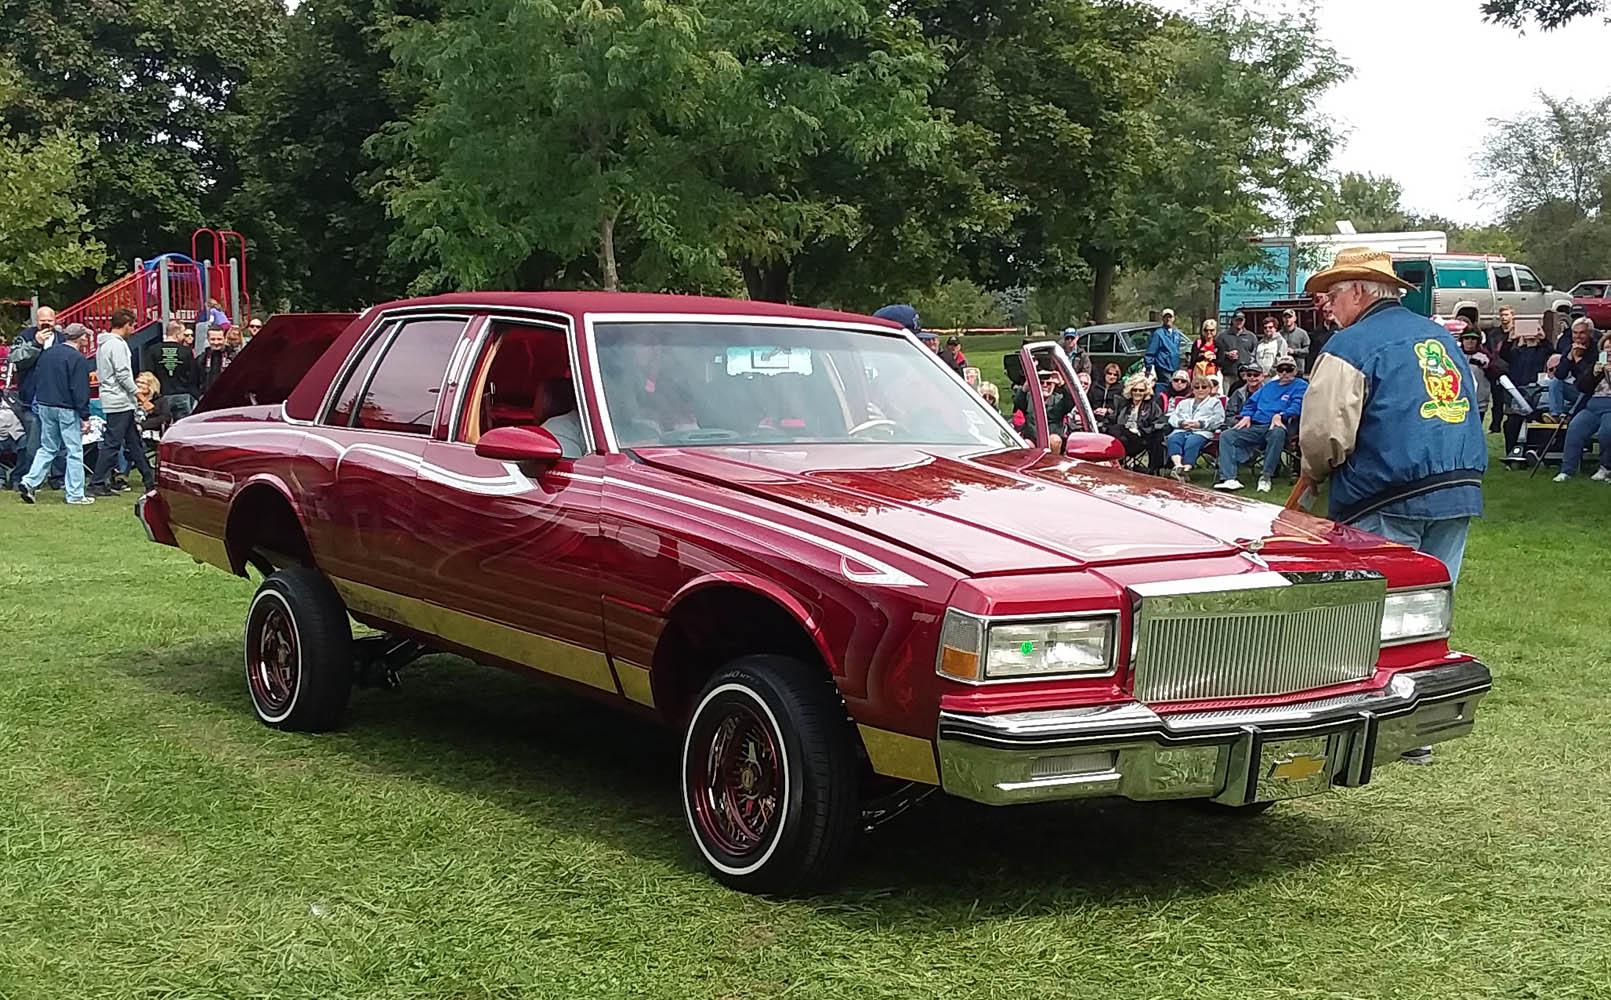 Specialty- 1984 Chevy Caprice, Jose Noriega 1